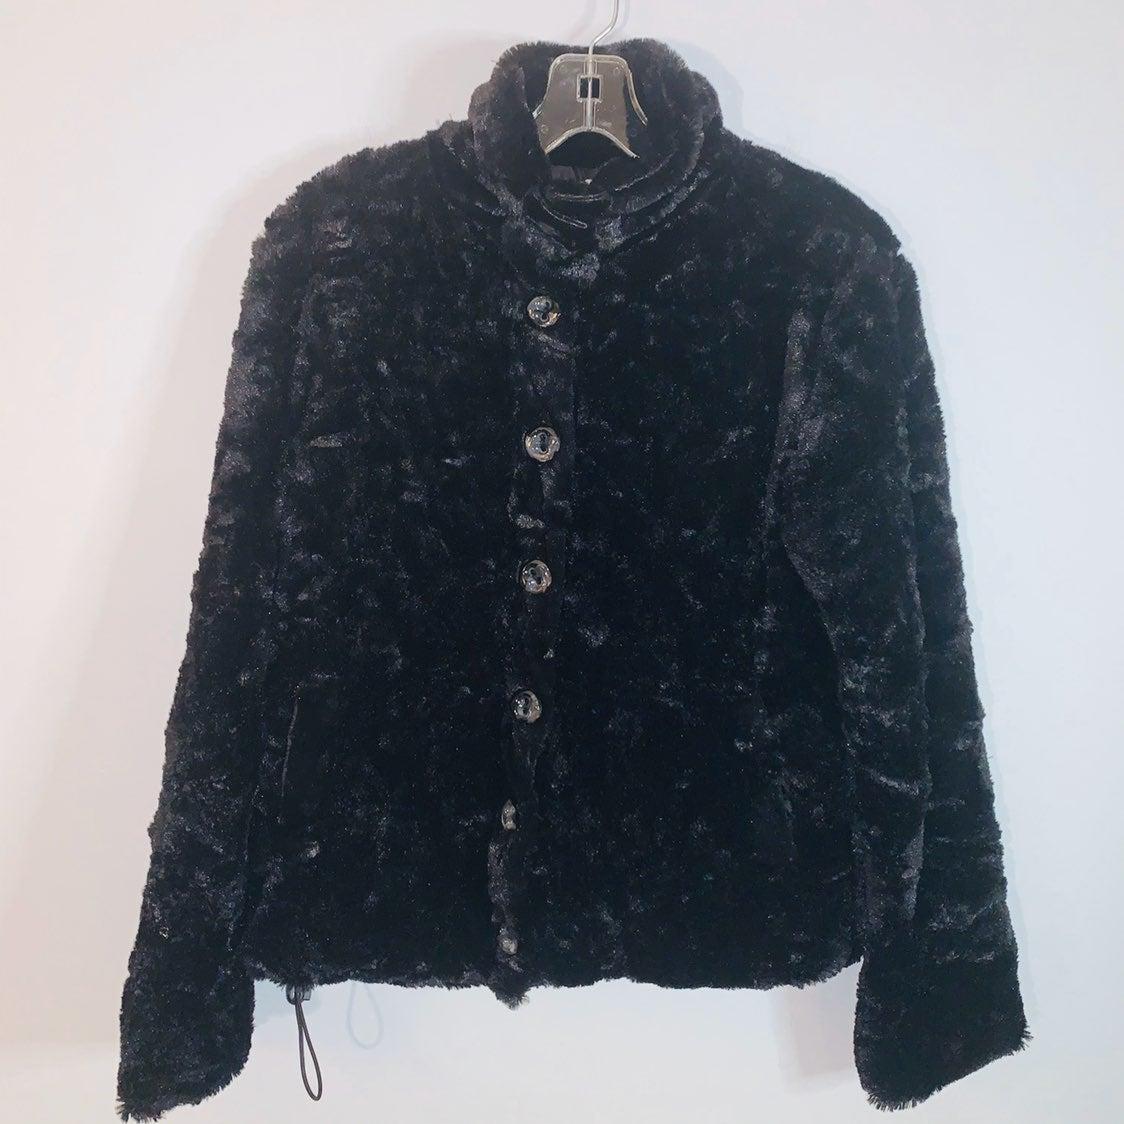 Carducci Medium black button up Jacket